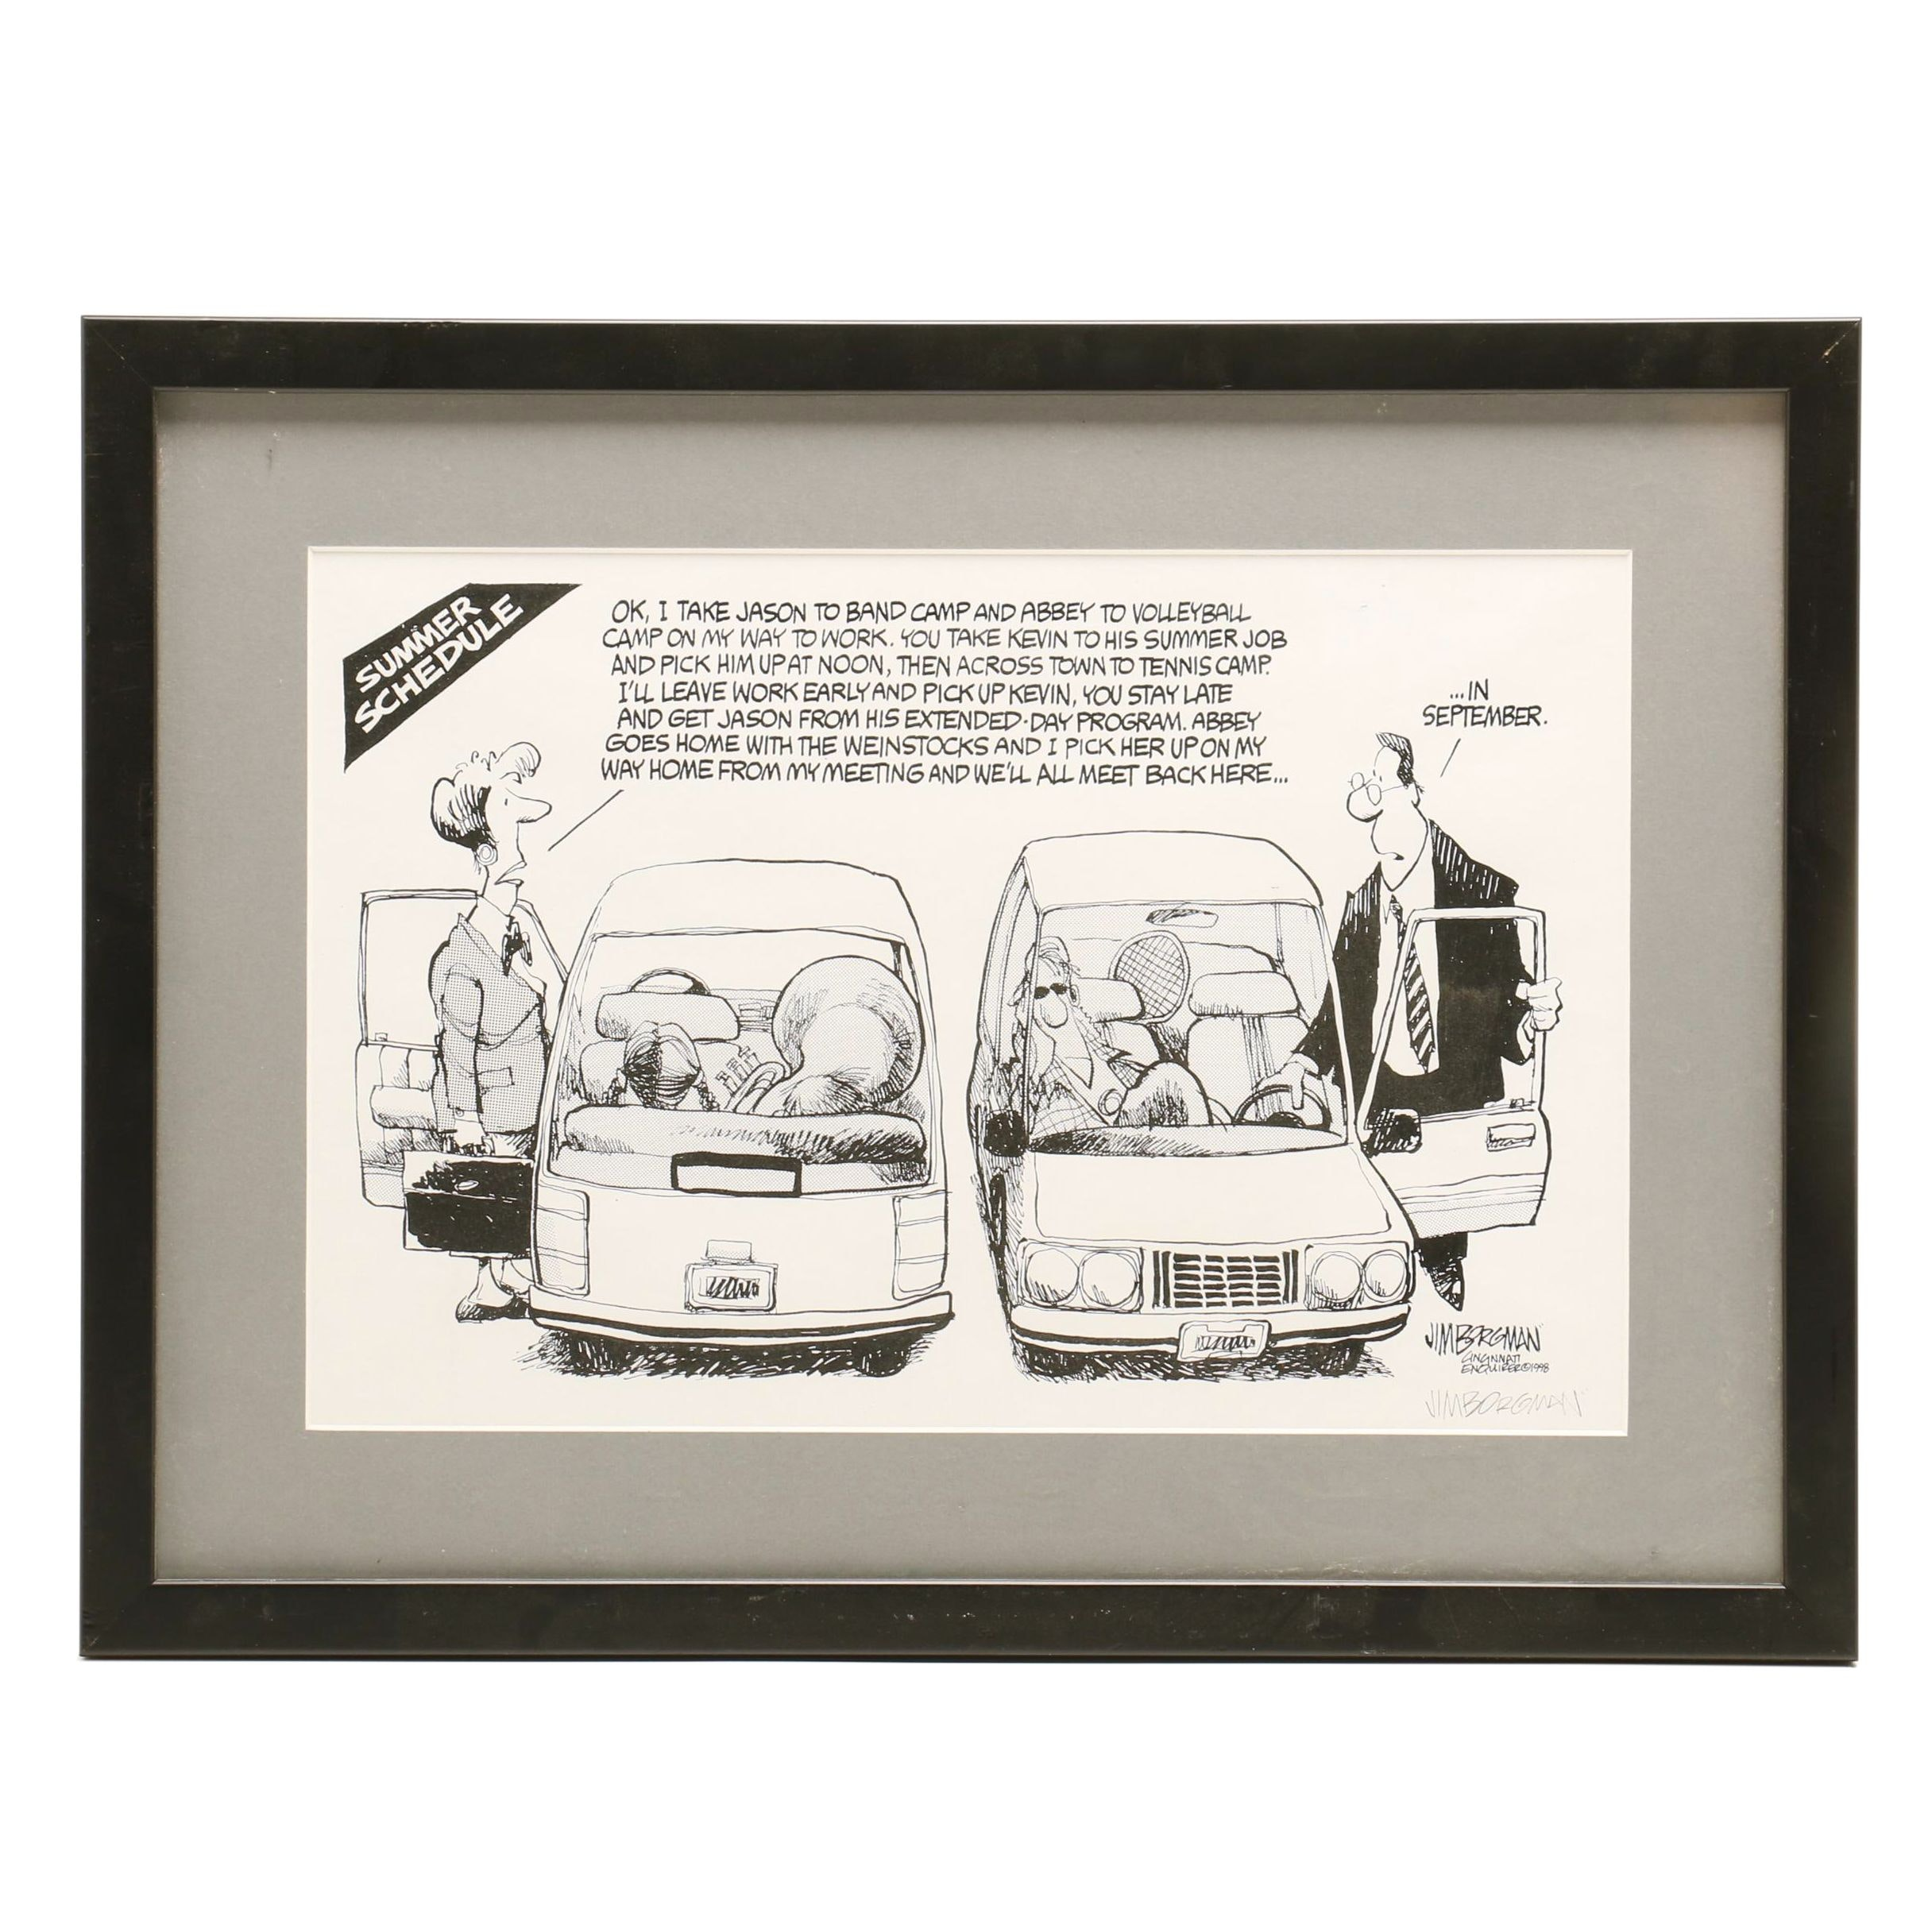 Lithographic Reproduction after Jim Borgman 1998 Cartoon Illustration